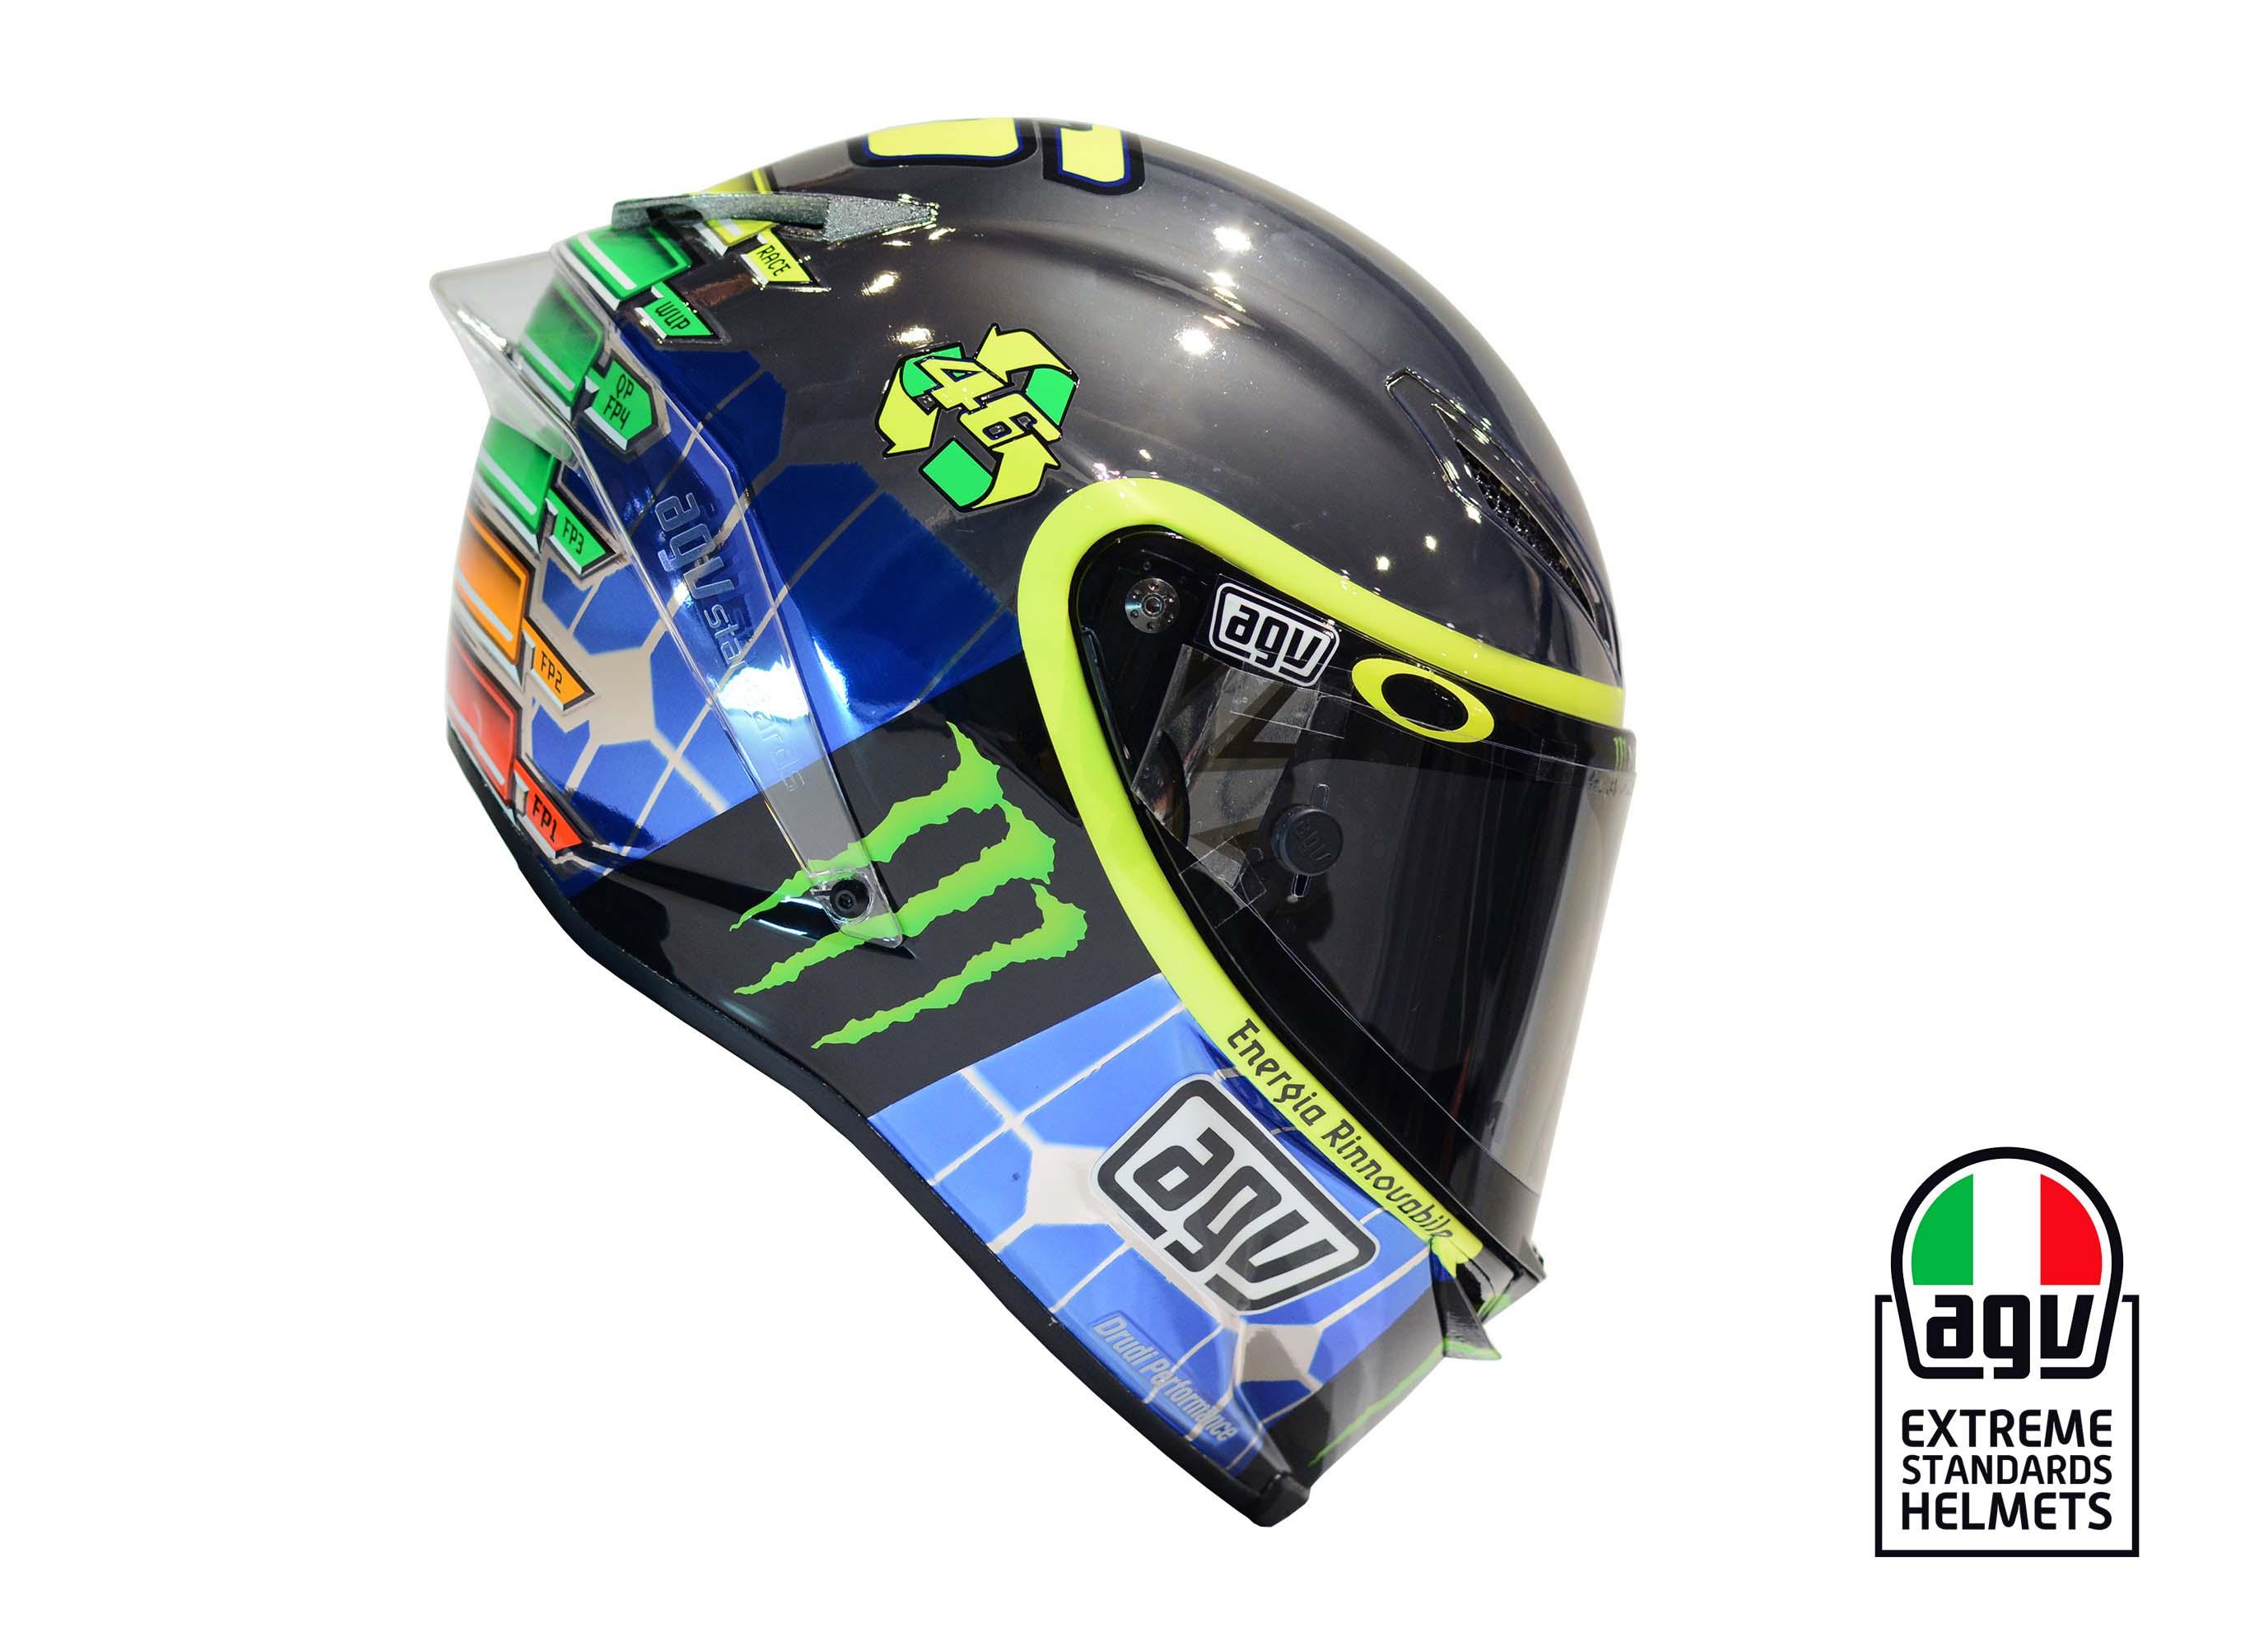 Valentino Rossi's 2015 Mugello AGV Helmet